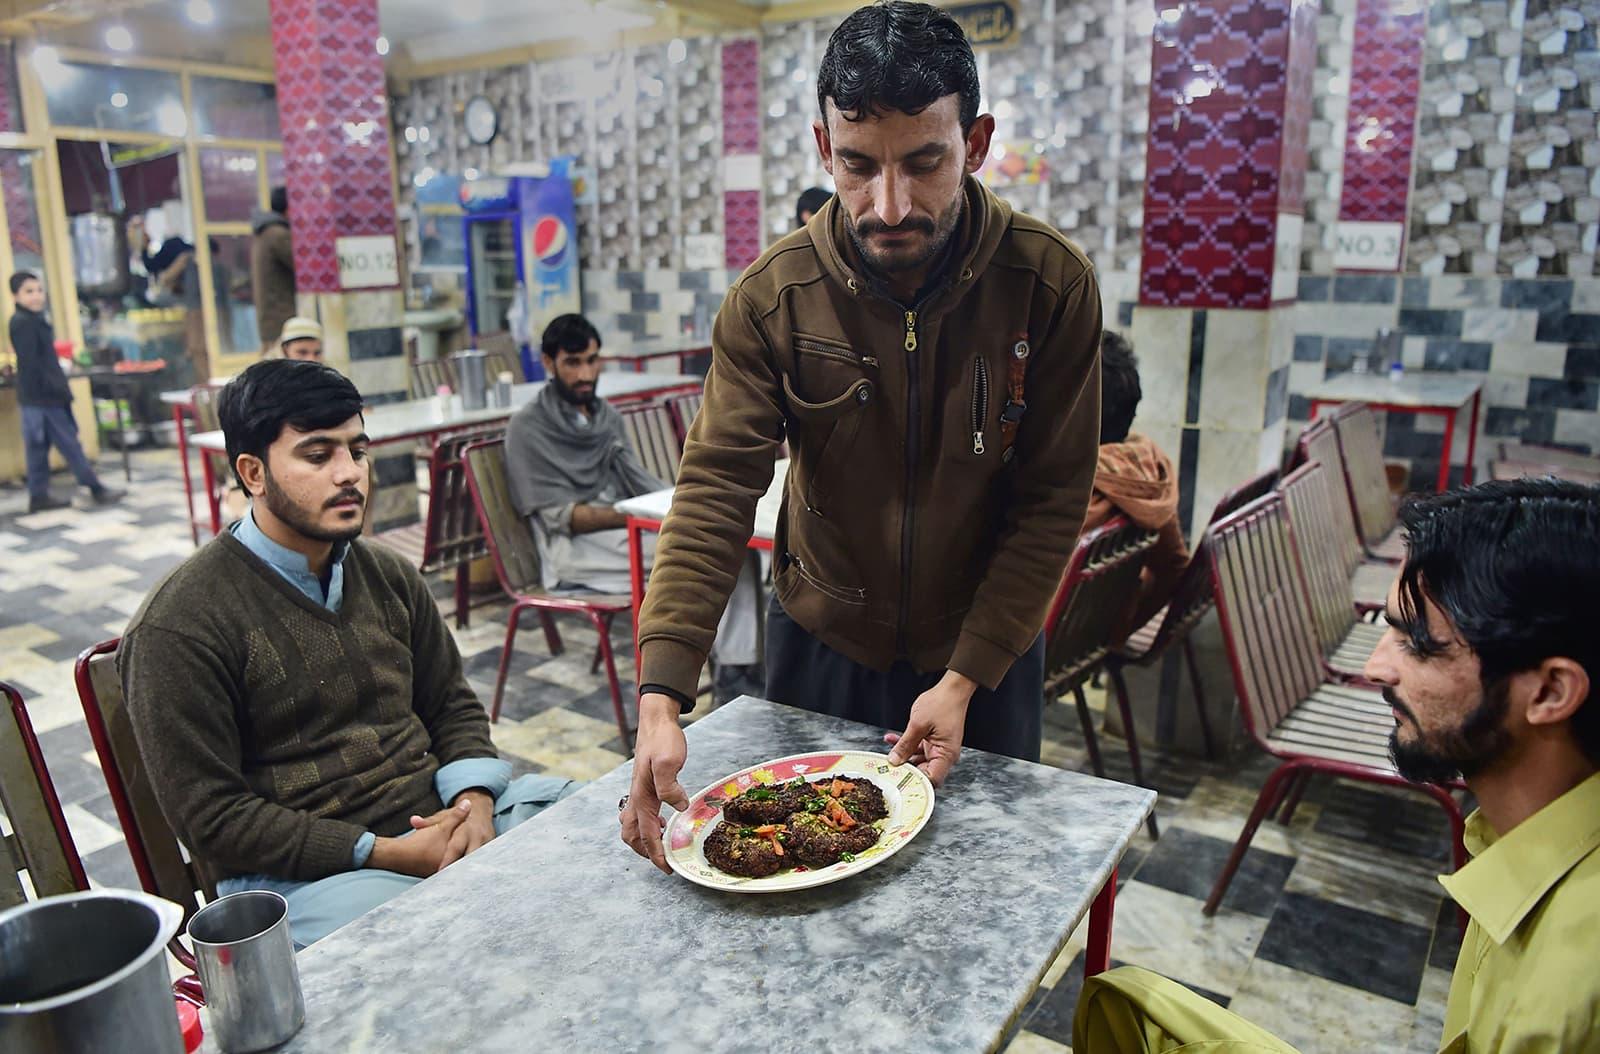 A man serves customers a plate of kebabs at the Tory Kebab House in Namak Mandi in Peshawar. — AFP